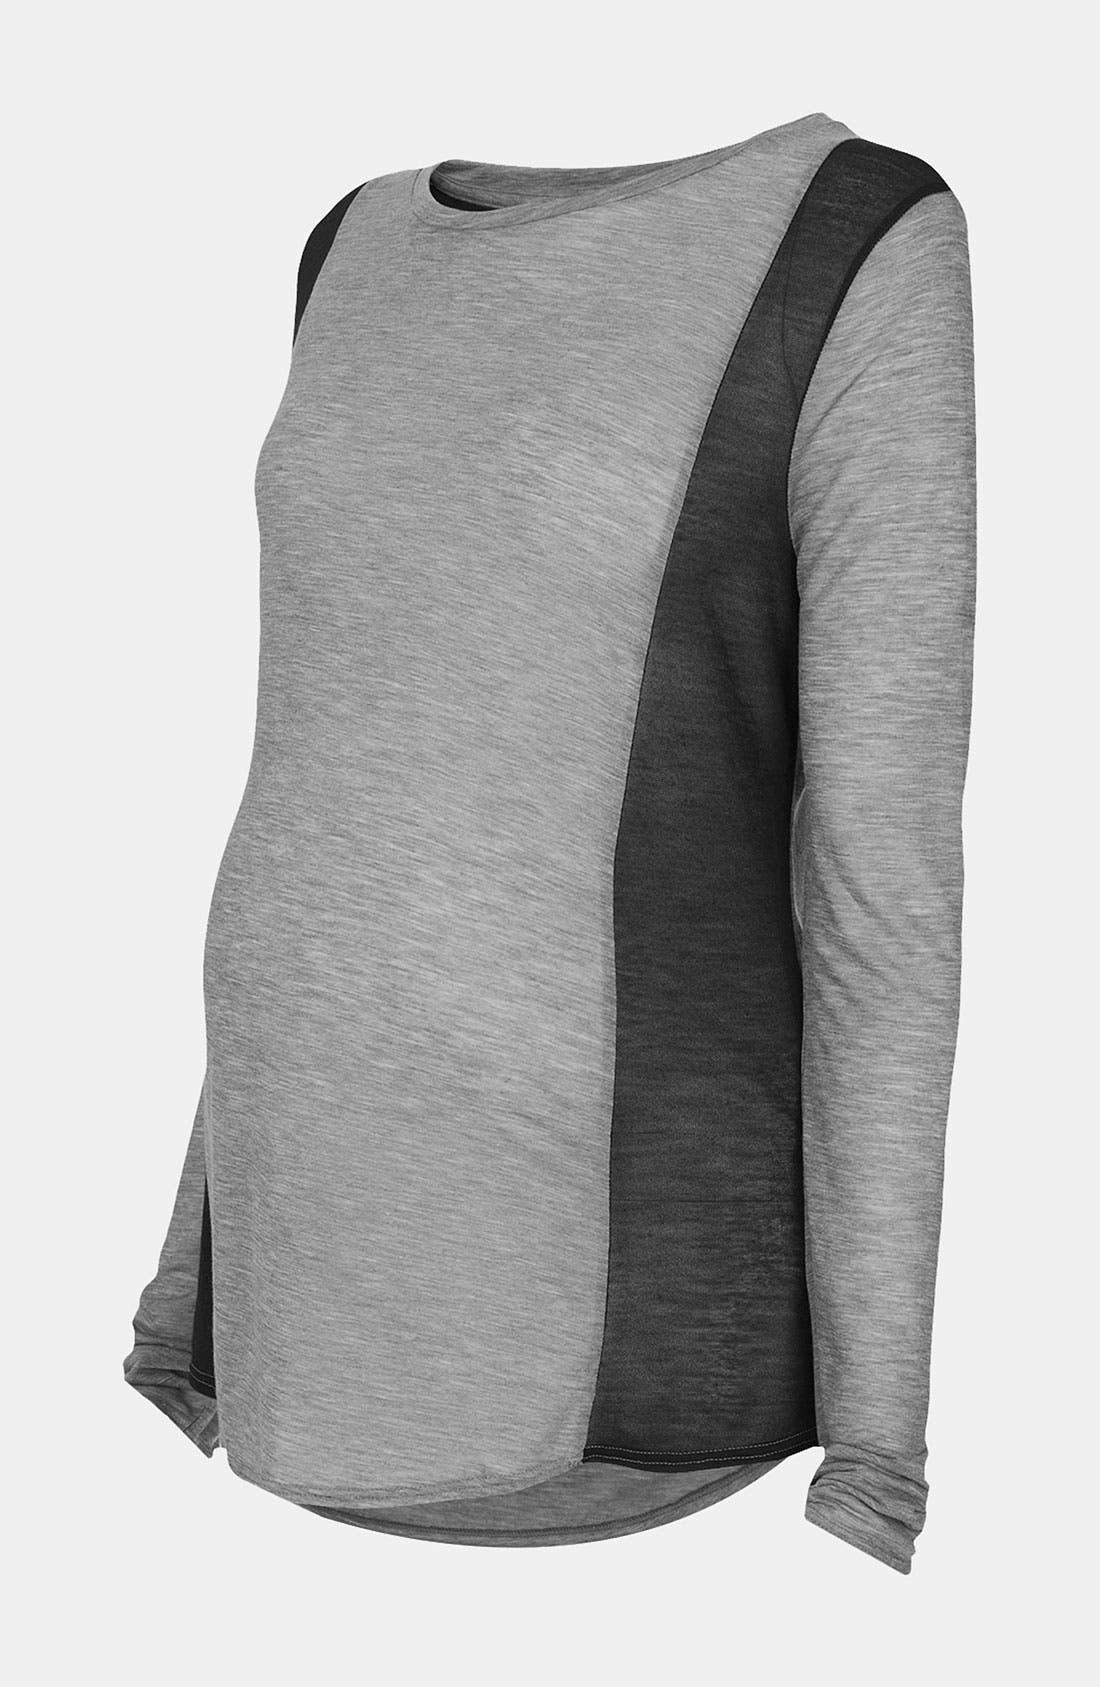 Alternate Image 1 Selected - Topshop Mesh Panel Maternity Top